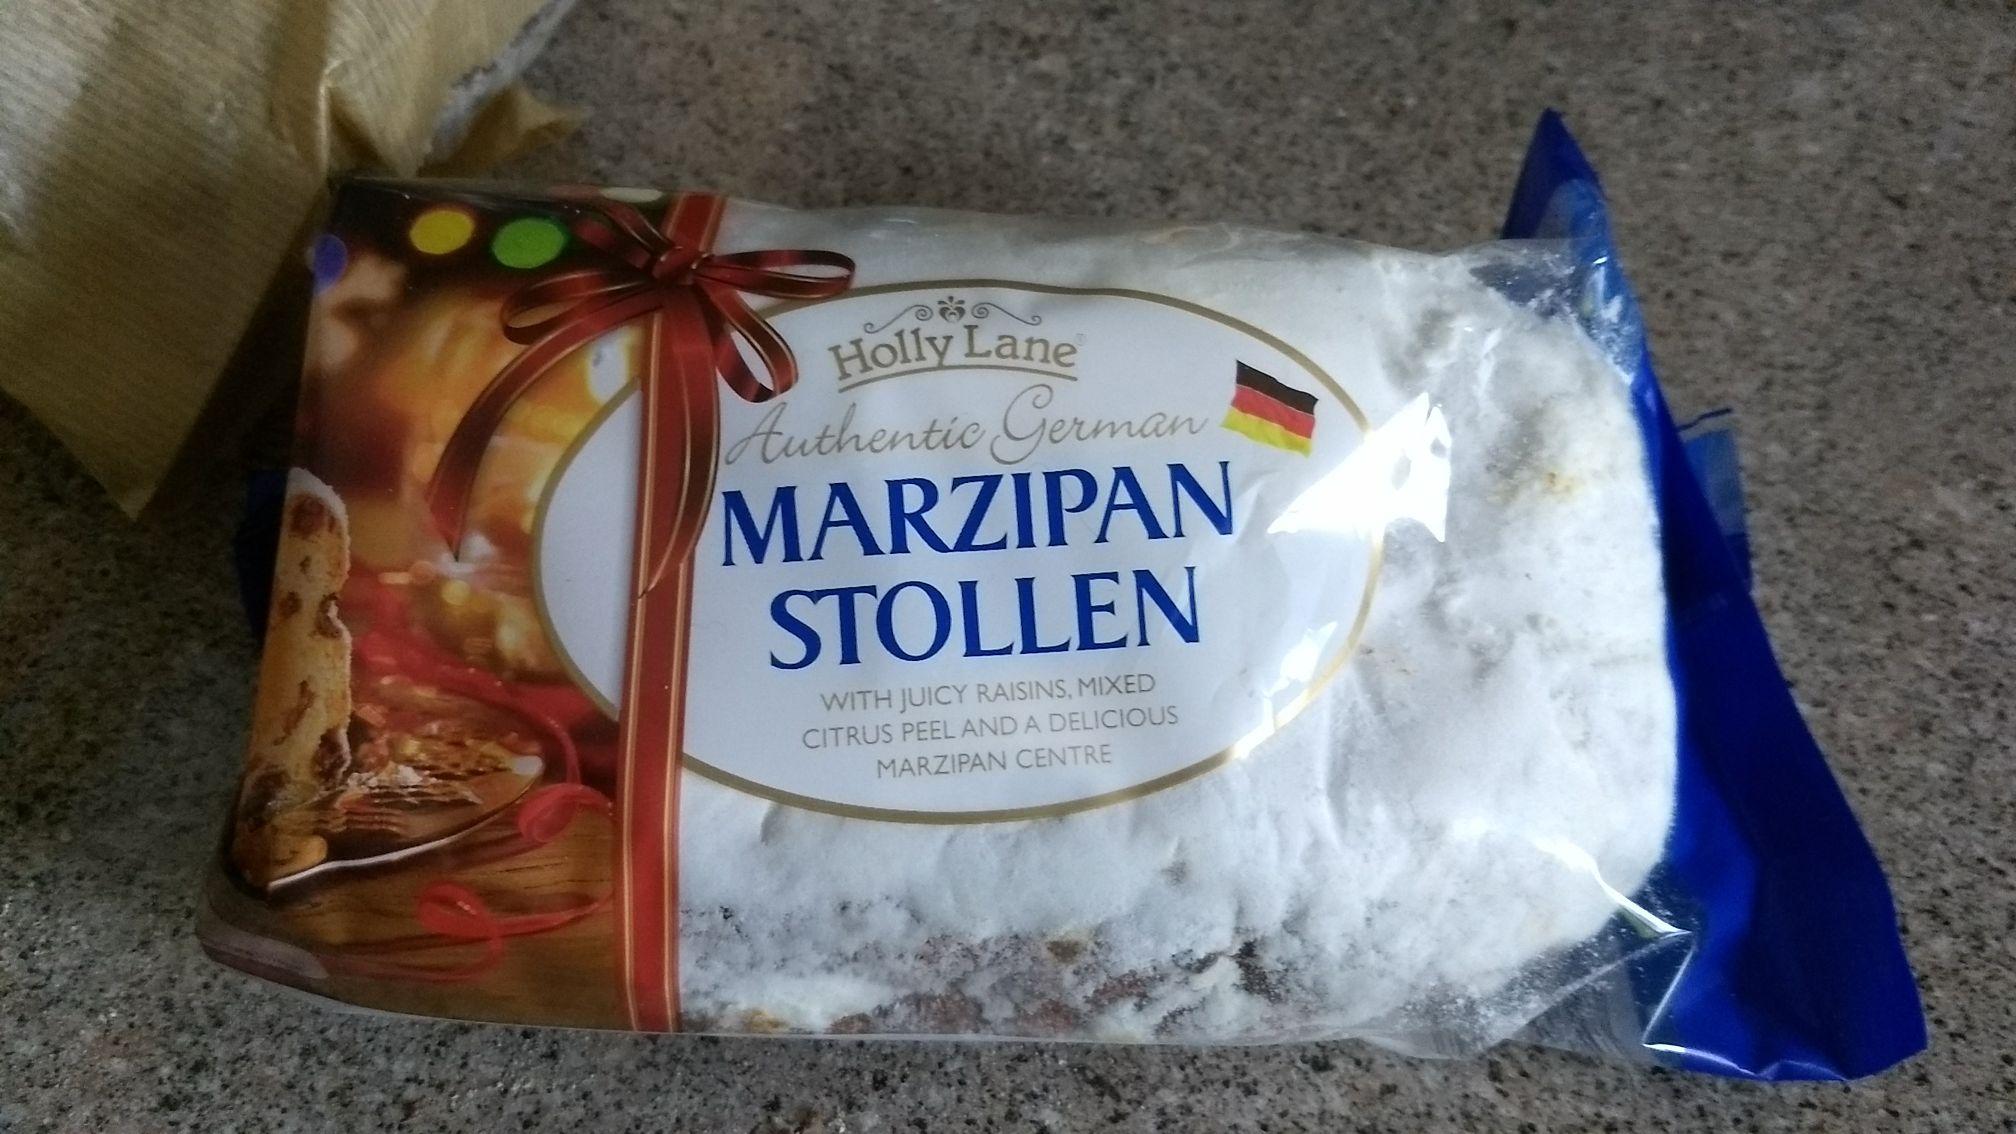 Aldi Marzipan Stollen 99p